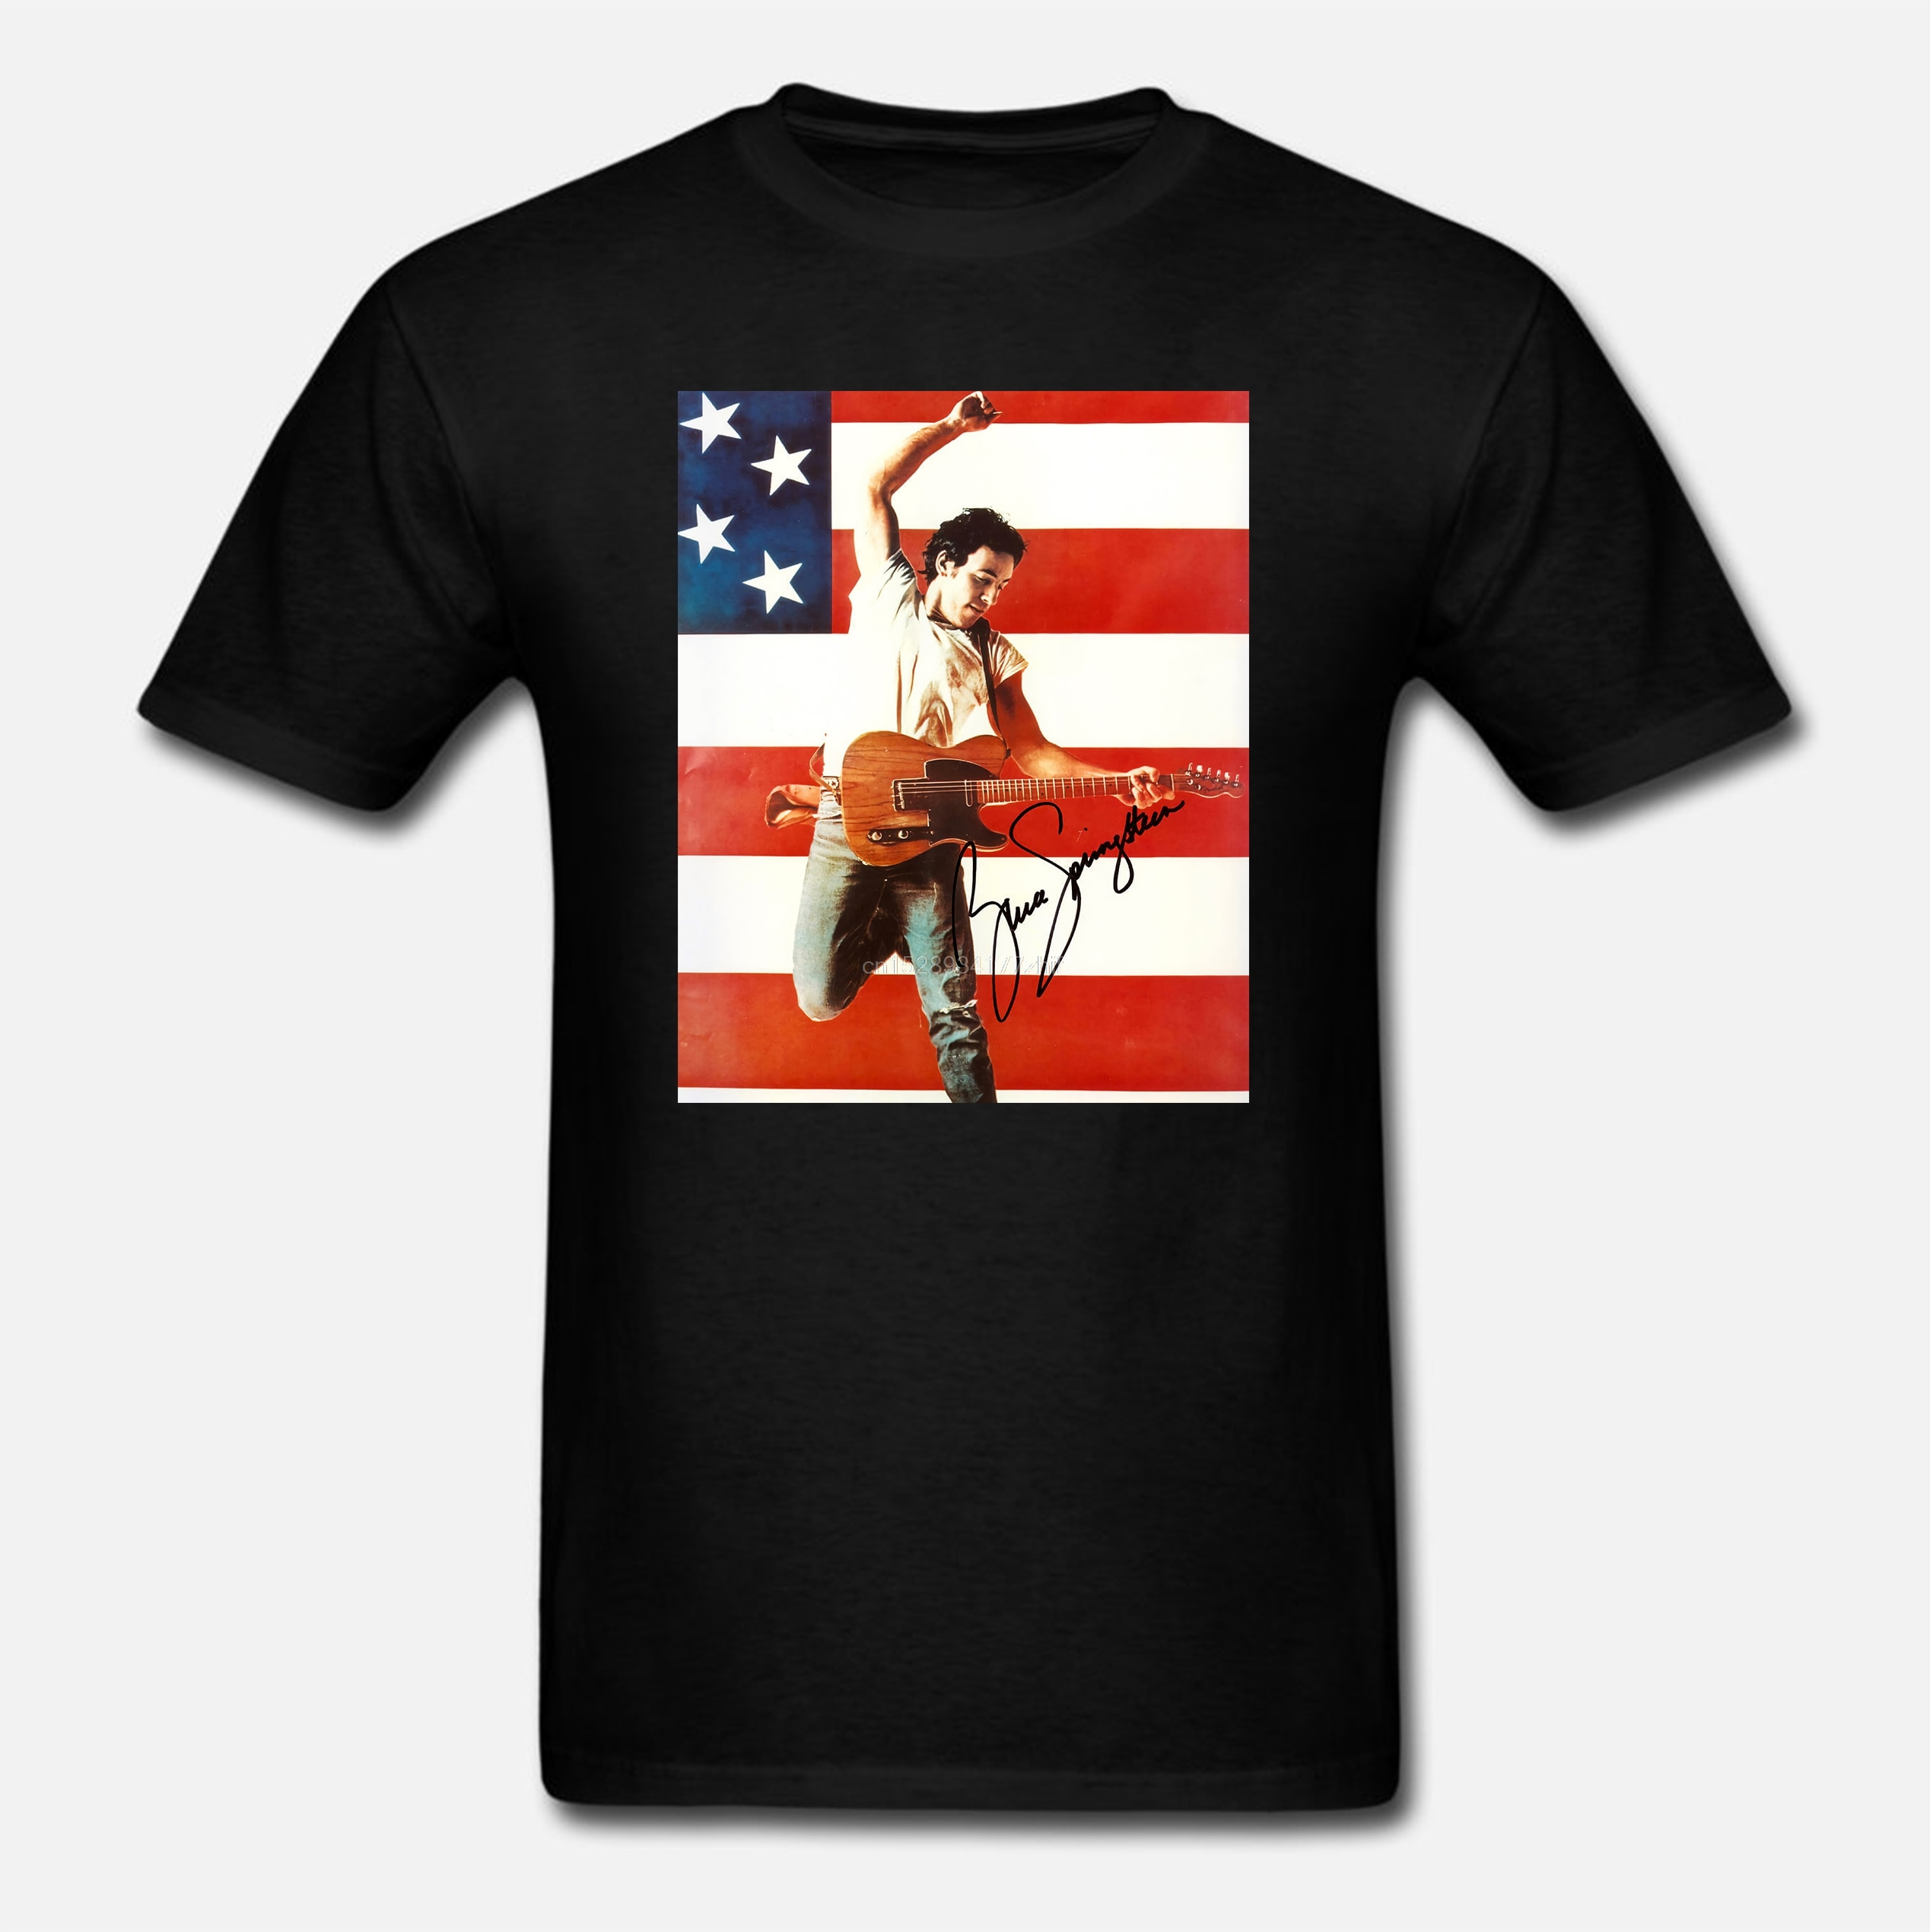 Camiseta a la moda de verano para hombre, Camiseta estampada con Springsteen Born In The USA, divertida camiseta novedosa, camiseta para mujer 1